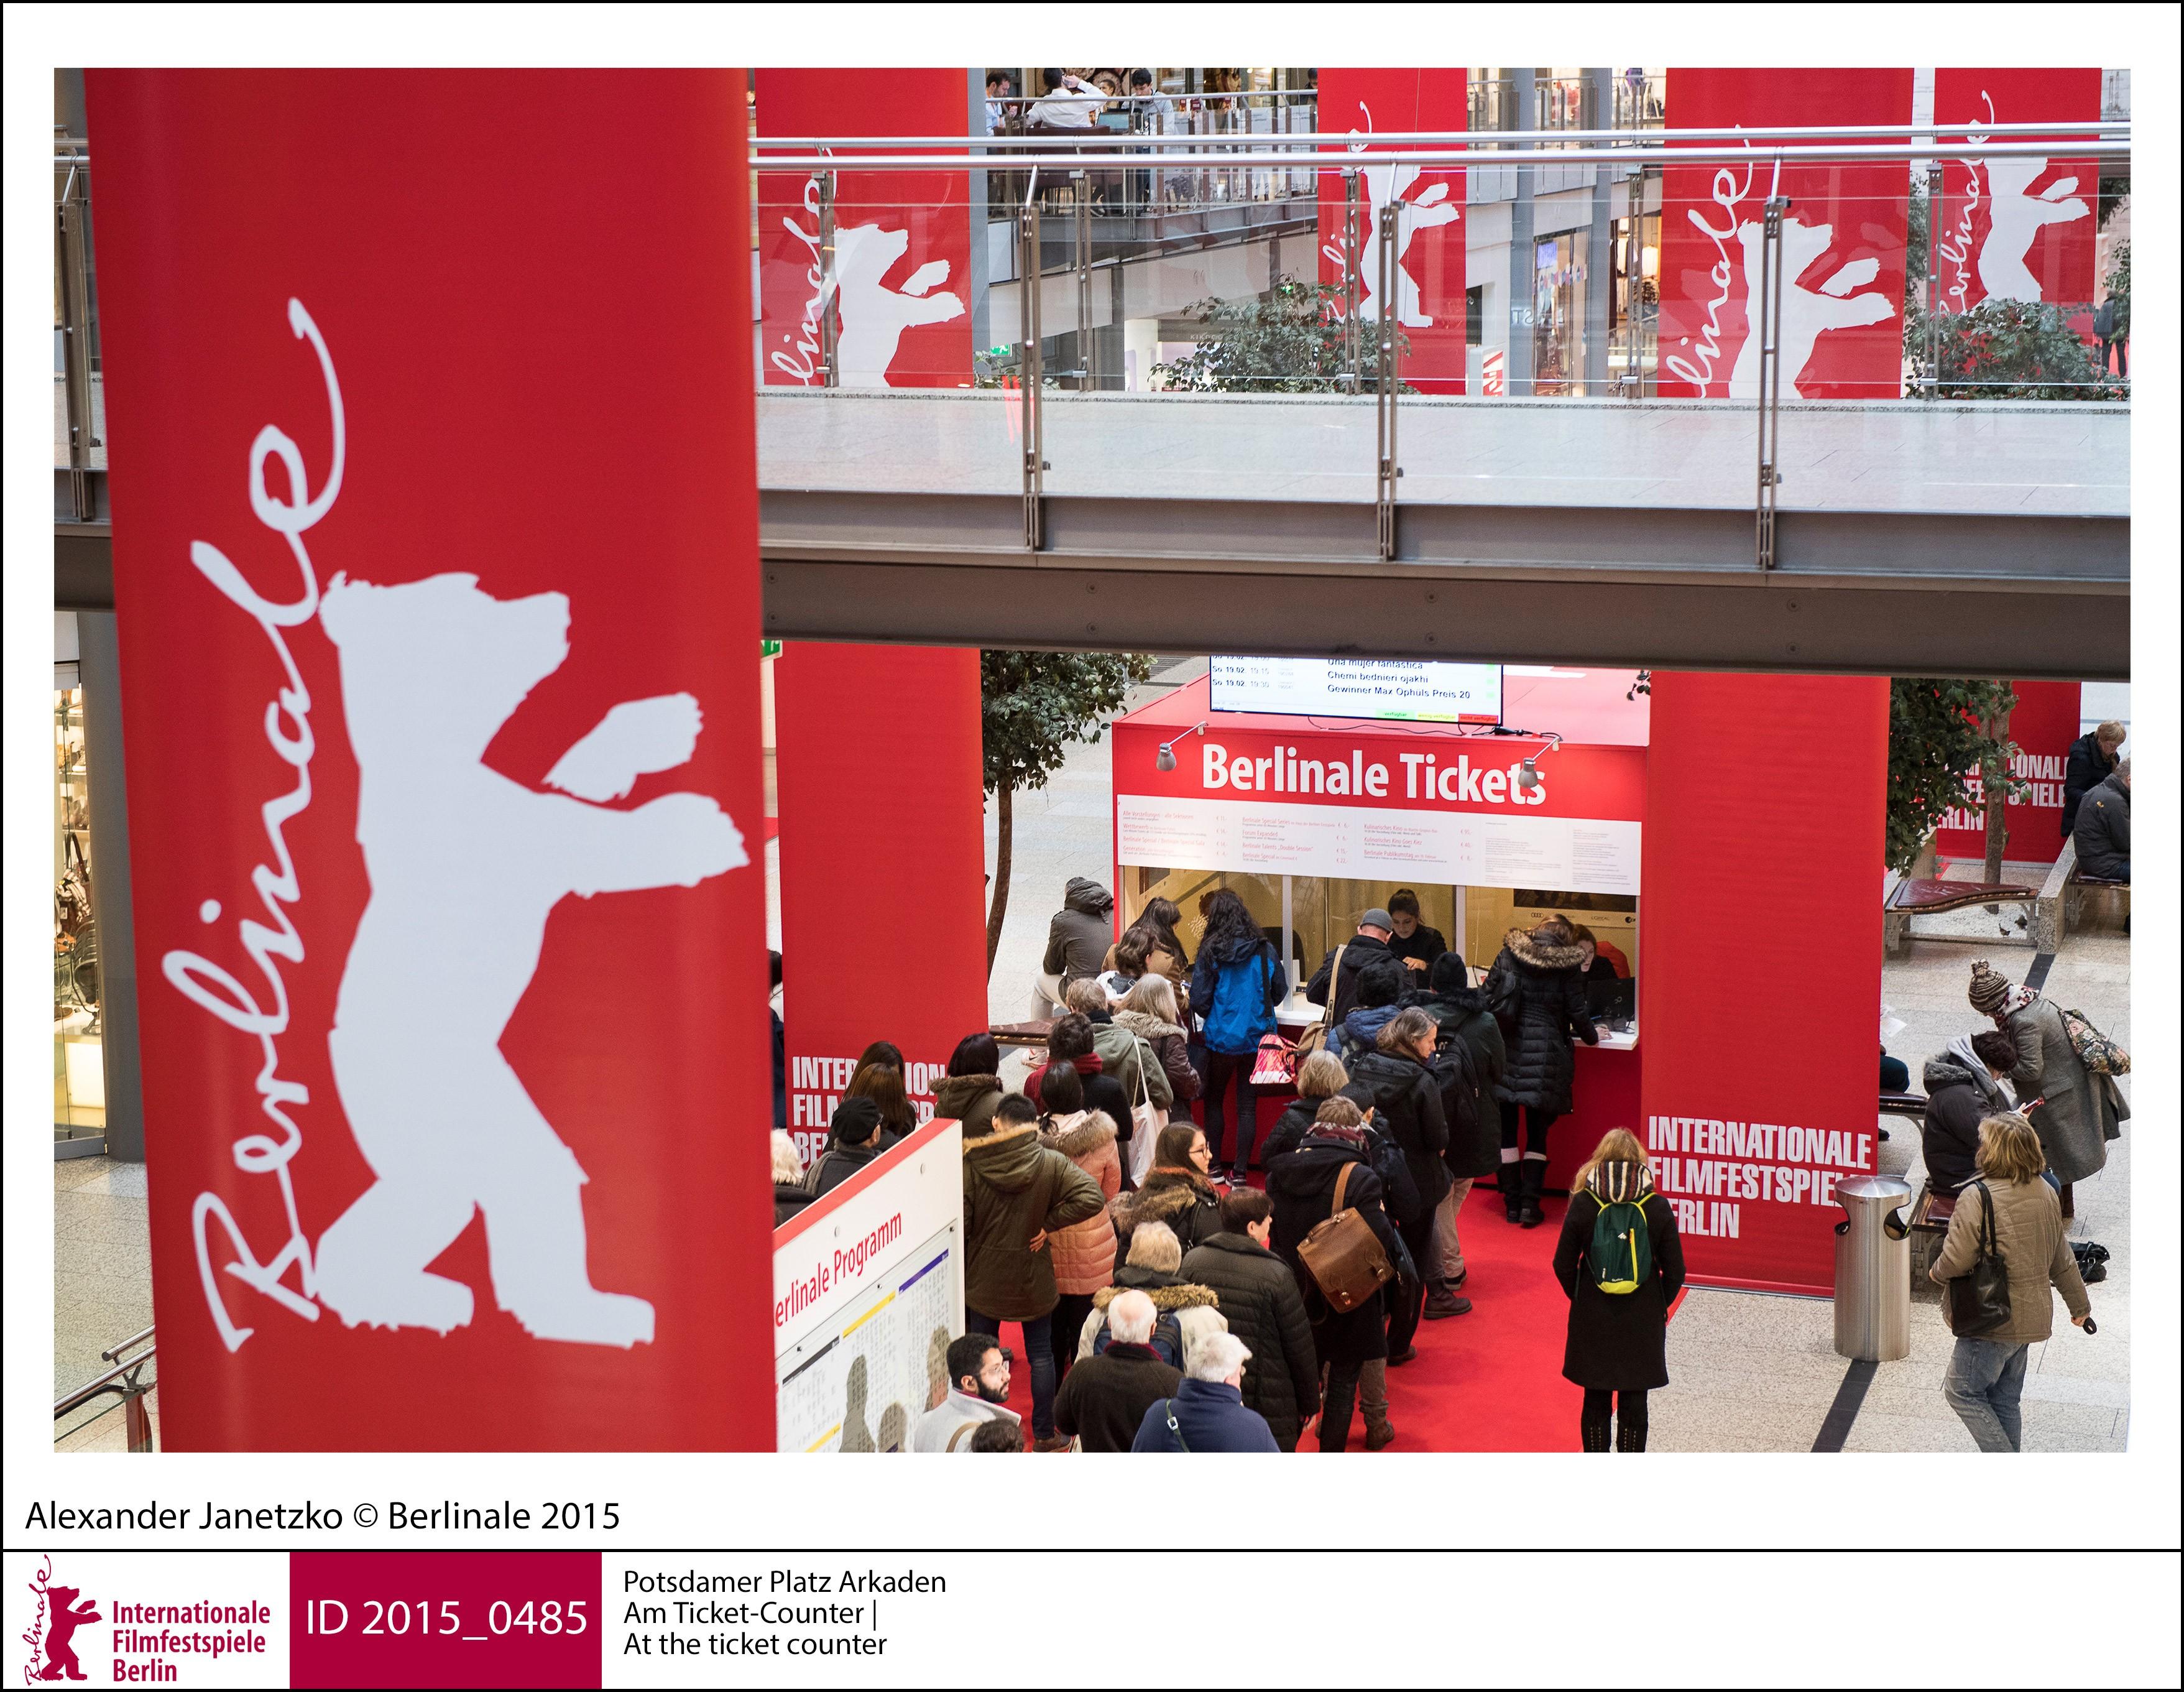 courtesy to Internationale Filmfestspiele Berlin